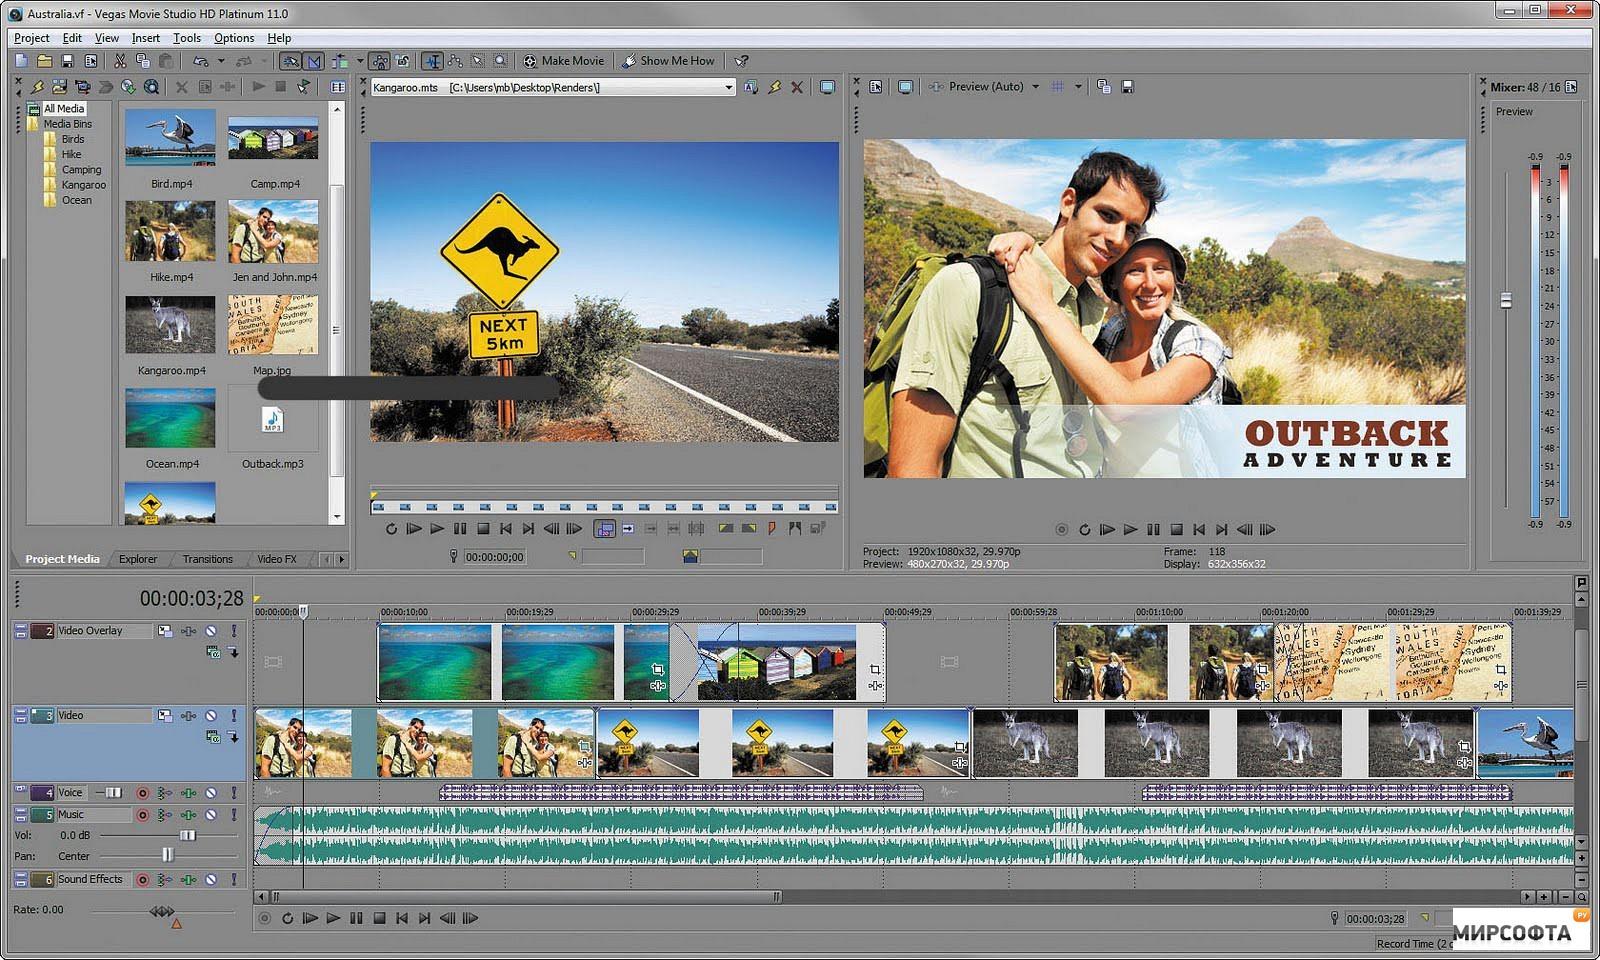 Movie capture programs